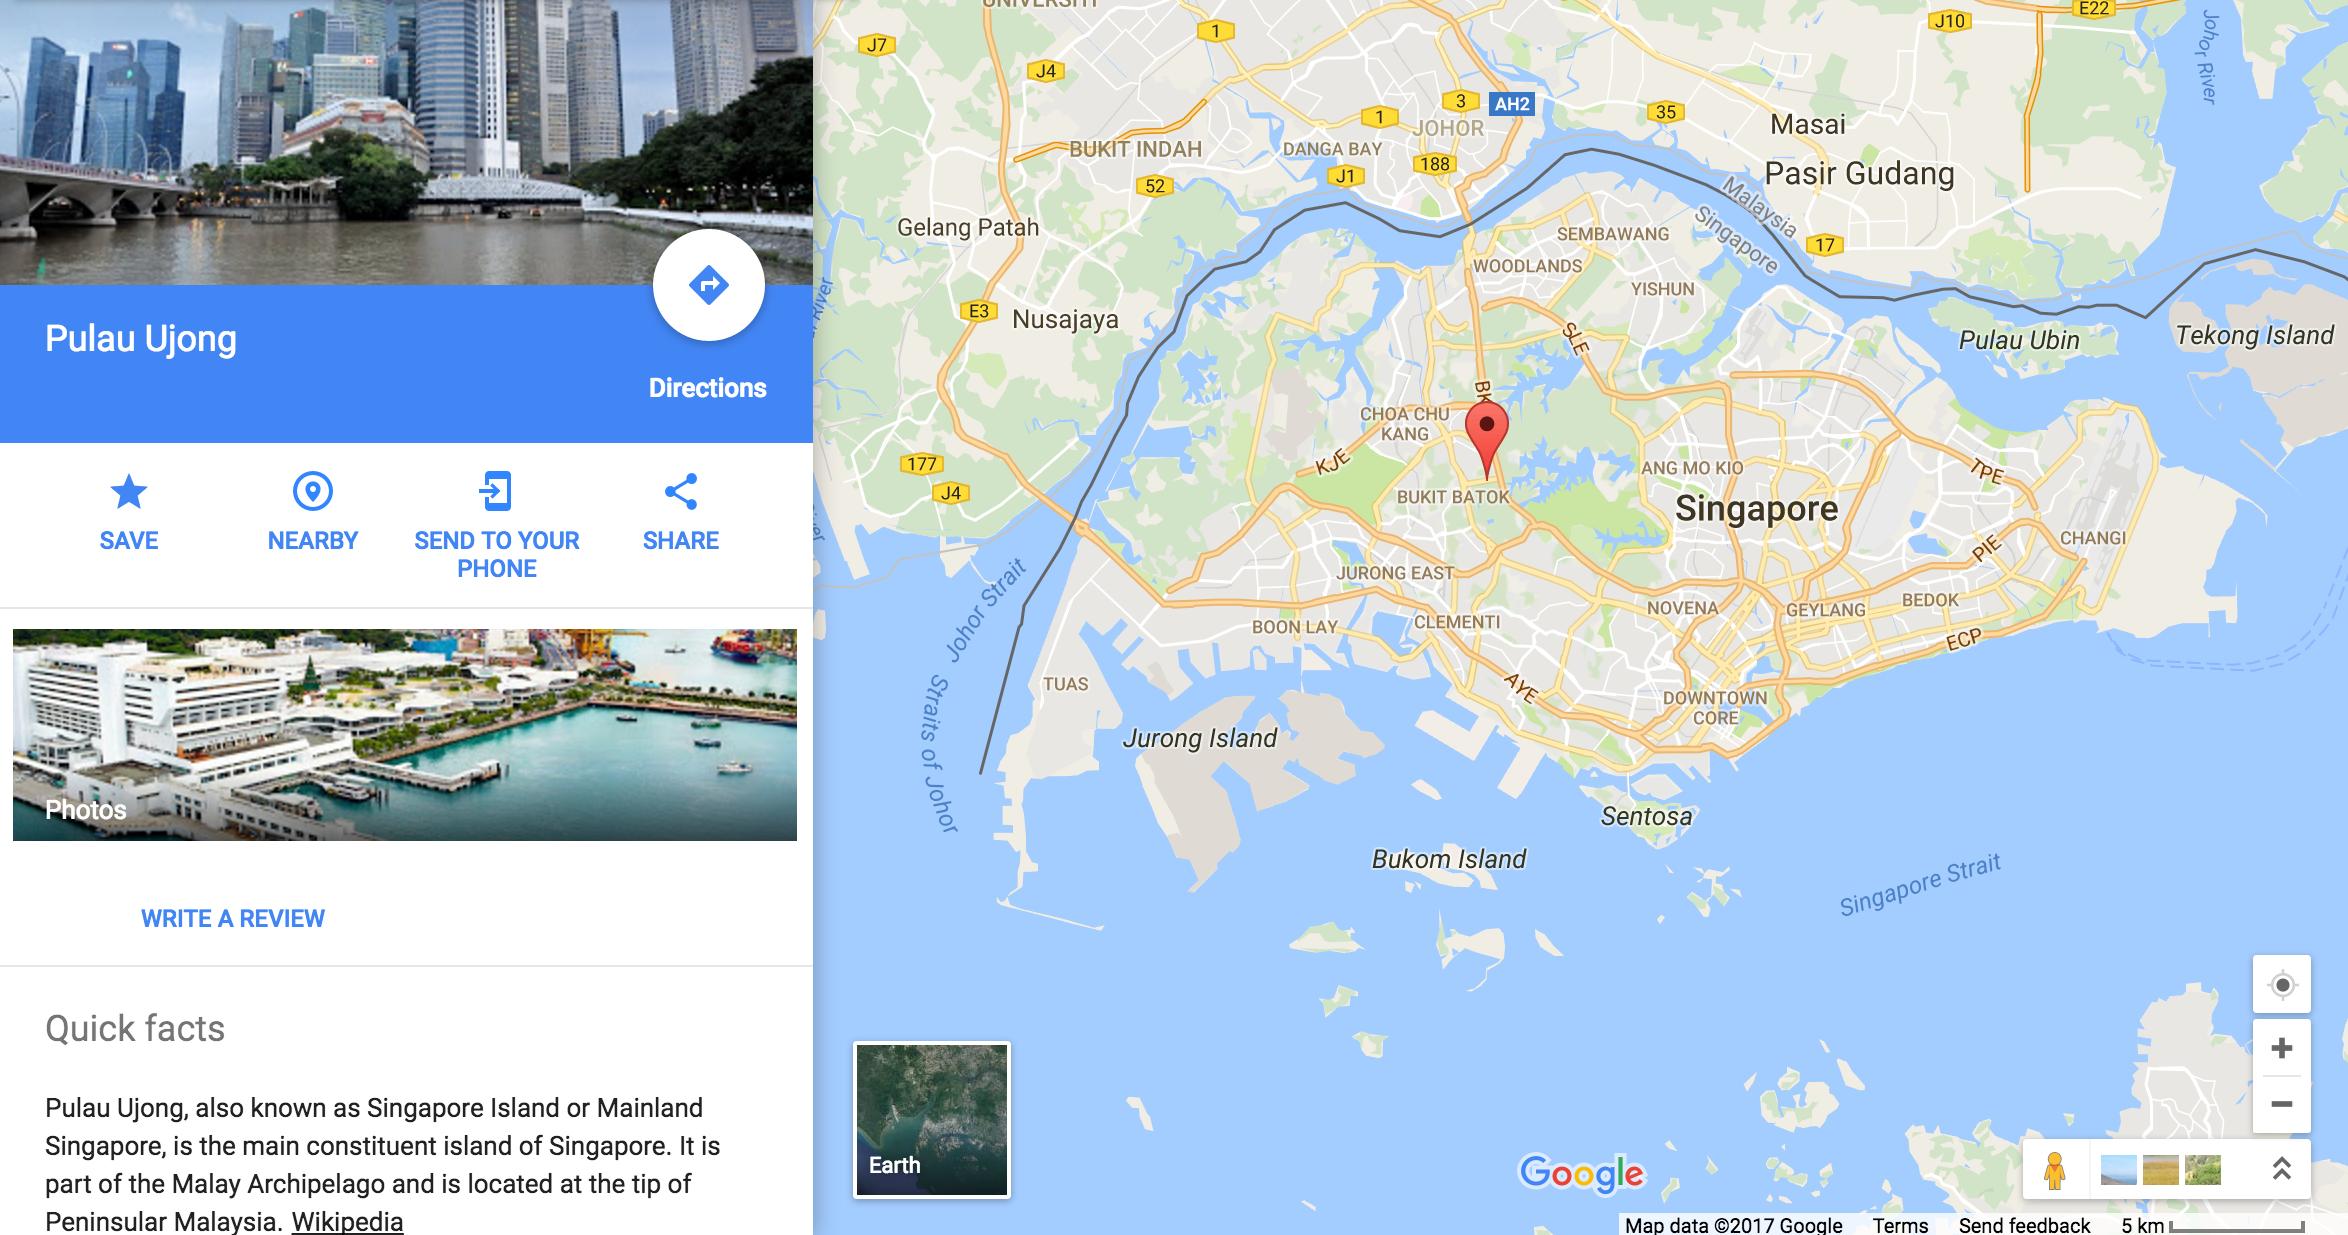 pulau ujong singapore history